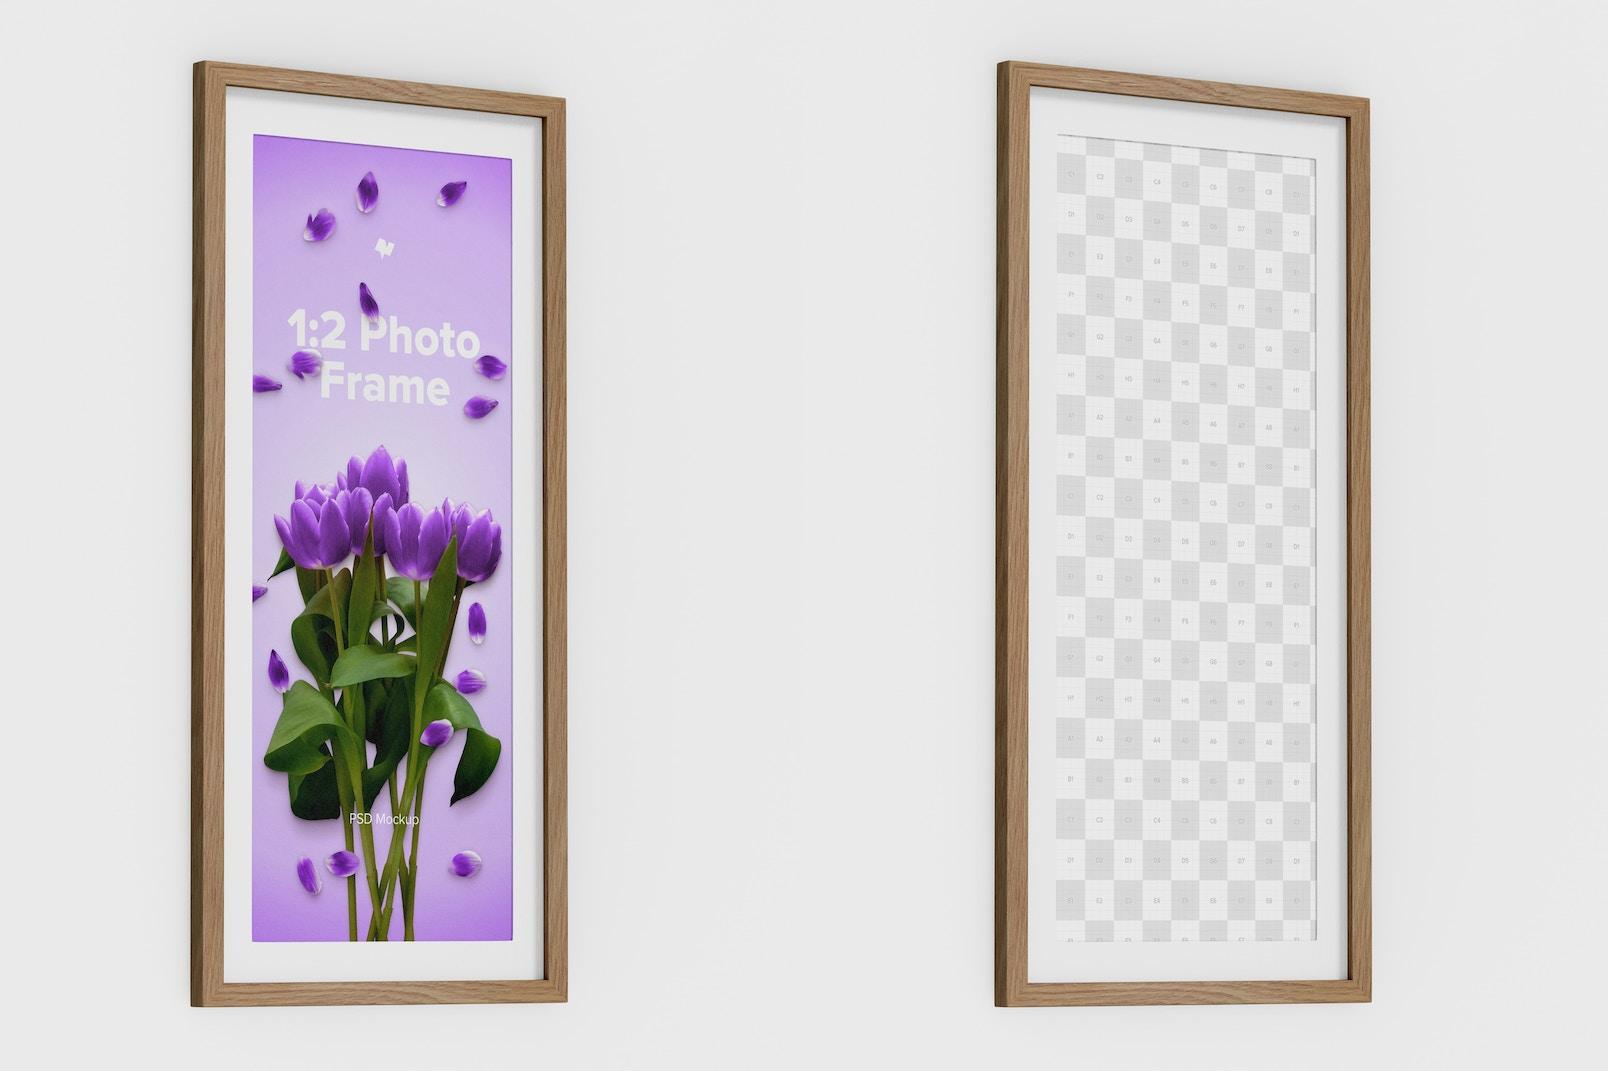 1:2 Photo Frame Mockup, Left View